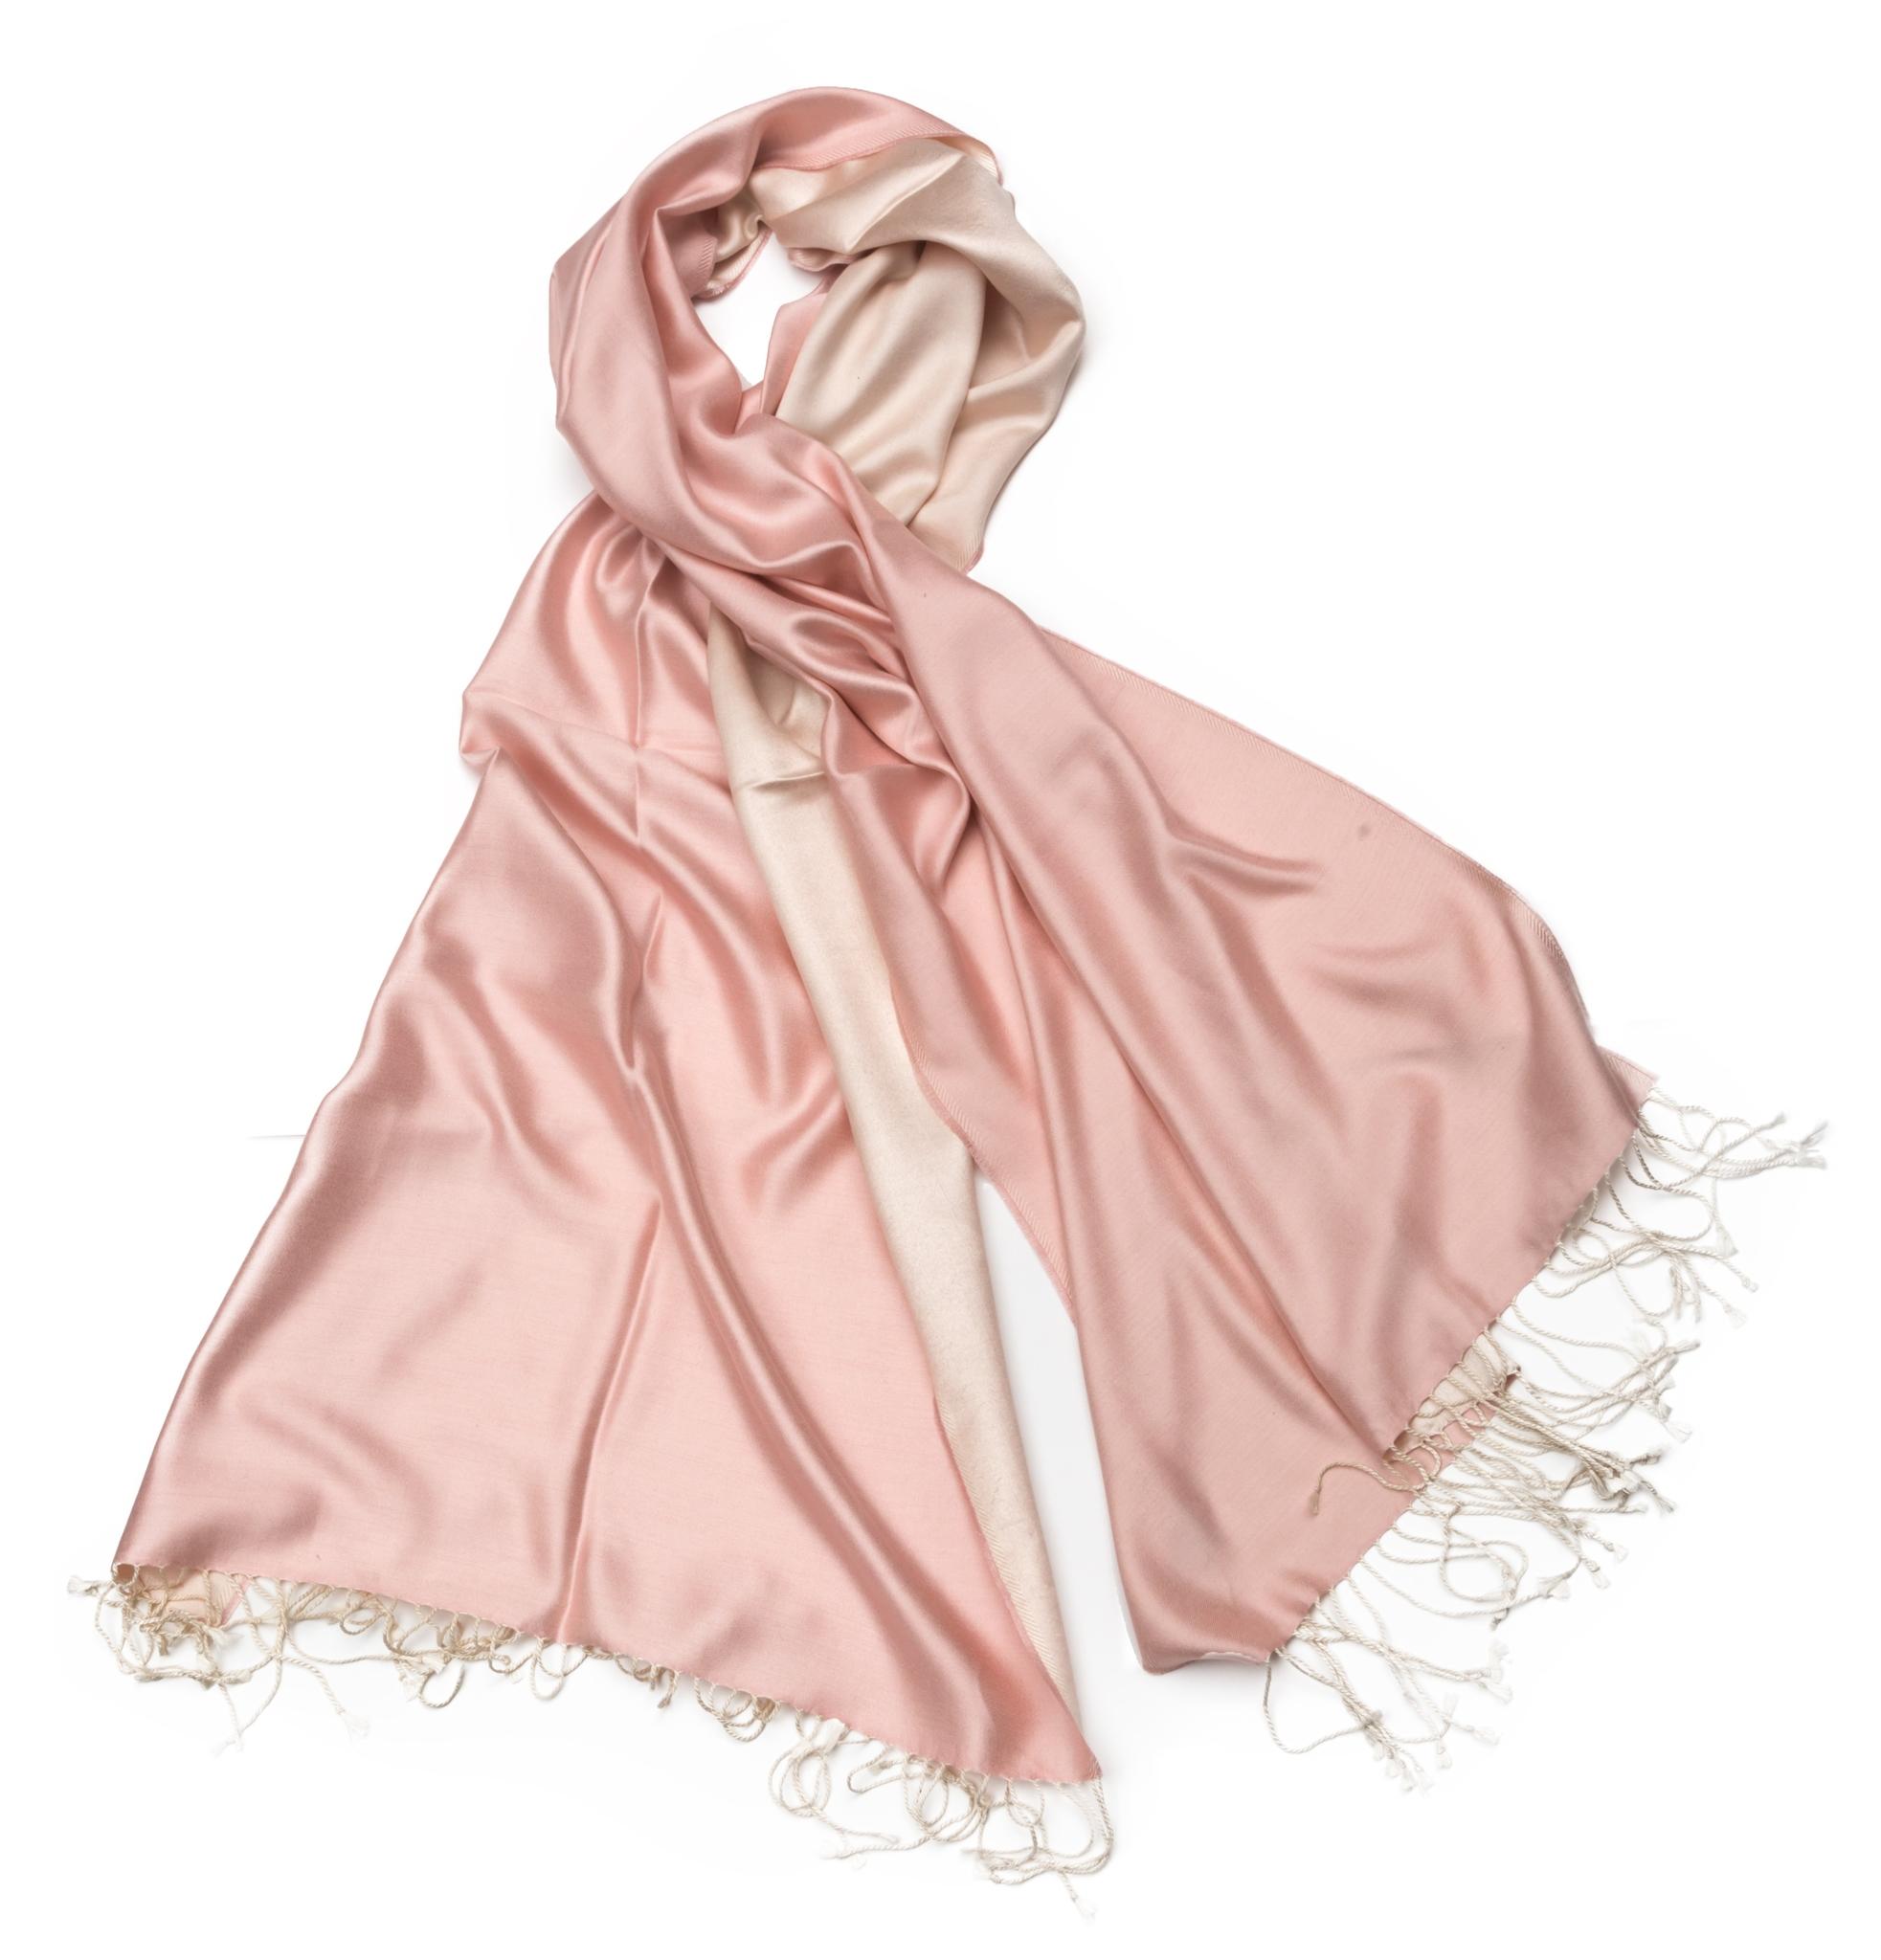 Одежда Шарф 50х180 AM Paris Parati6 светло-розовый sharf-50h180-am-paris-parati6-svetlo-rozovyy-frantsiya.jpg